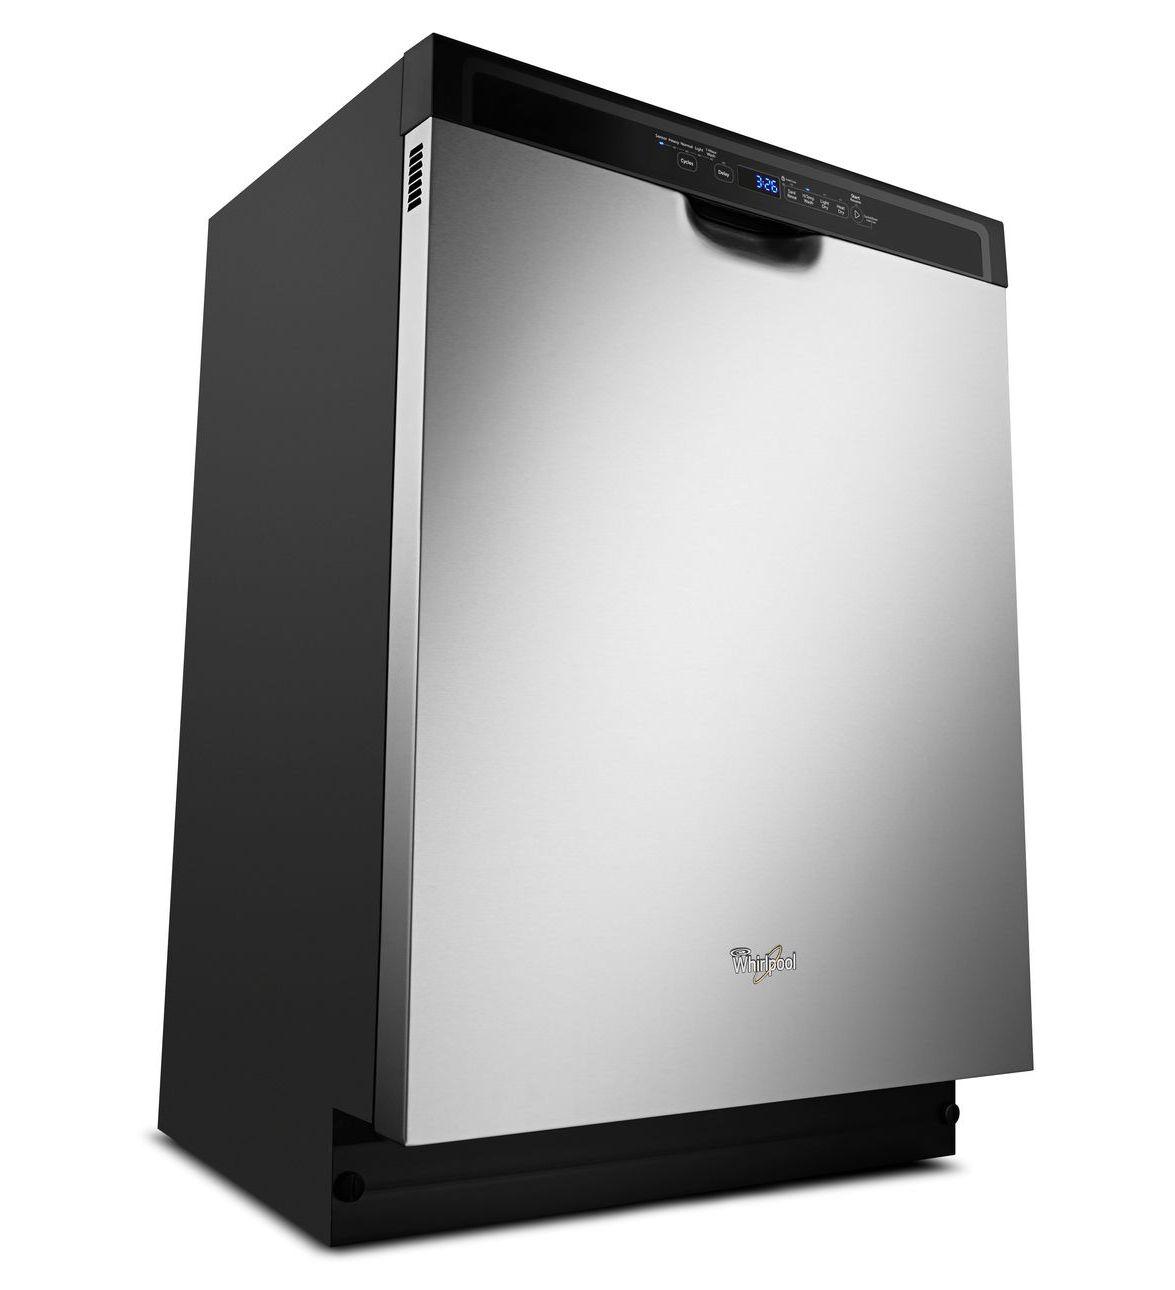 Whirlpool Wdf560safw Dishwasher With Adaptive Wash